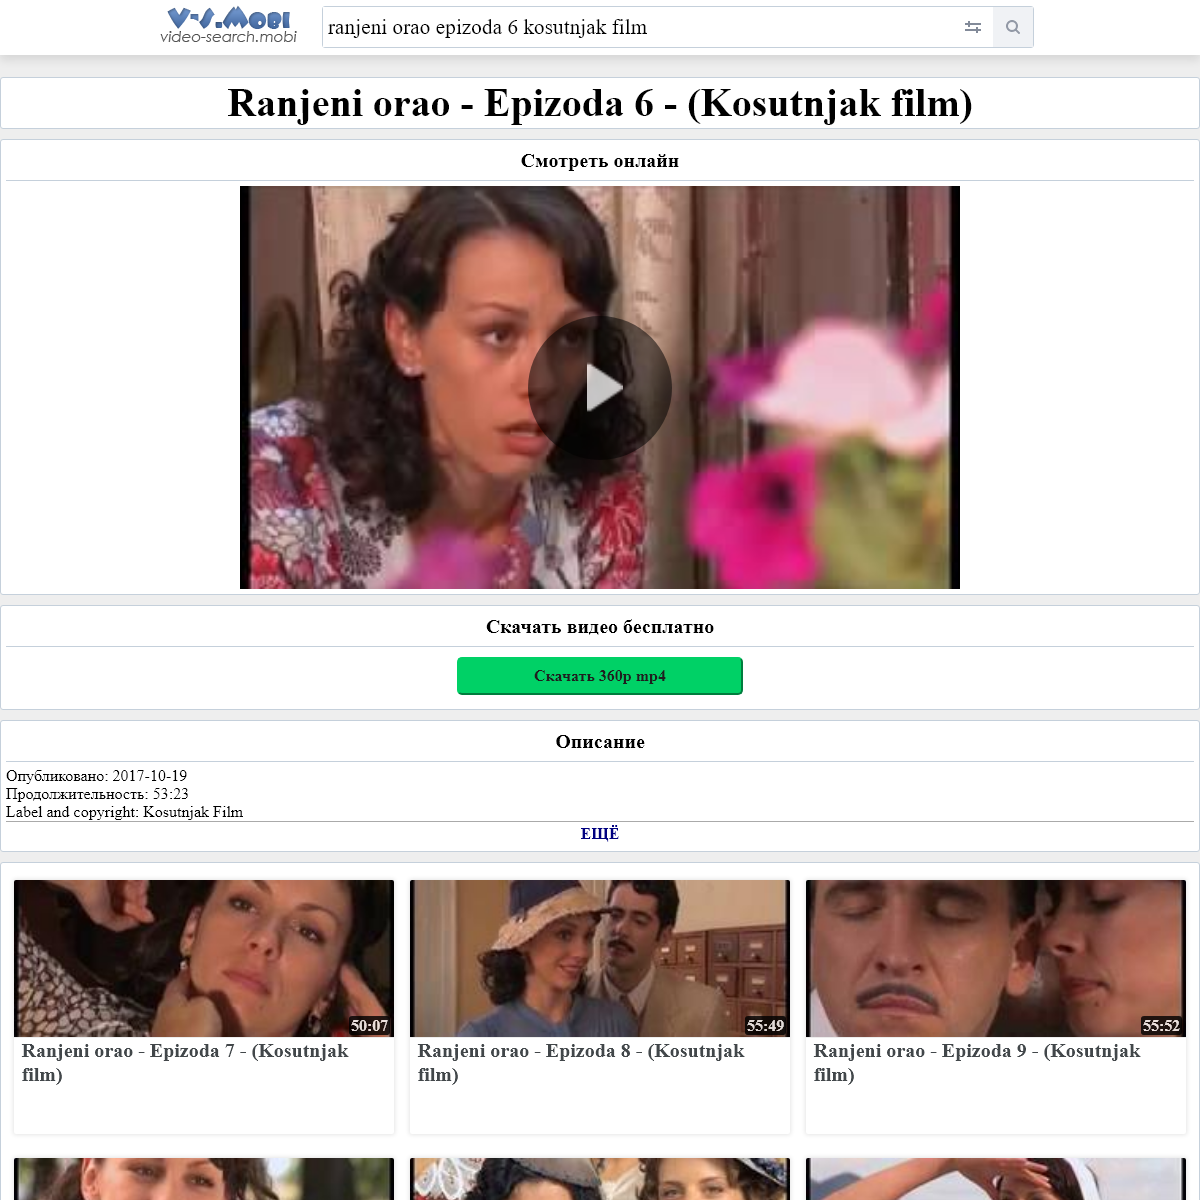 Скачать Ranjeni orao - Epizoda 6 - (Kosutnjak film) - смотреть онлайн